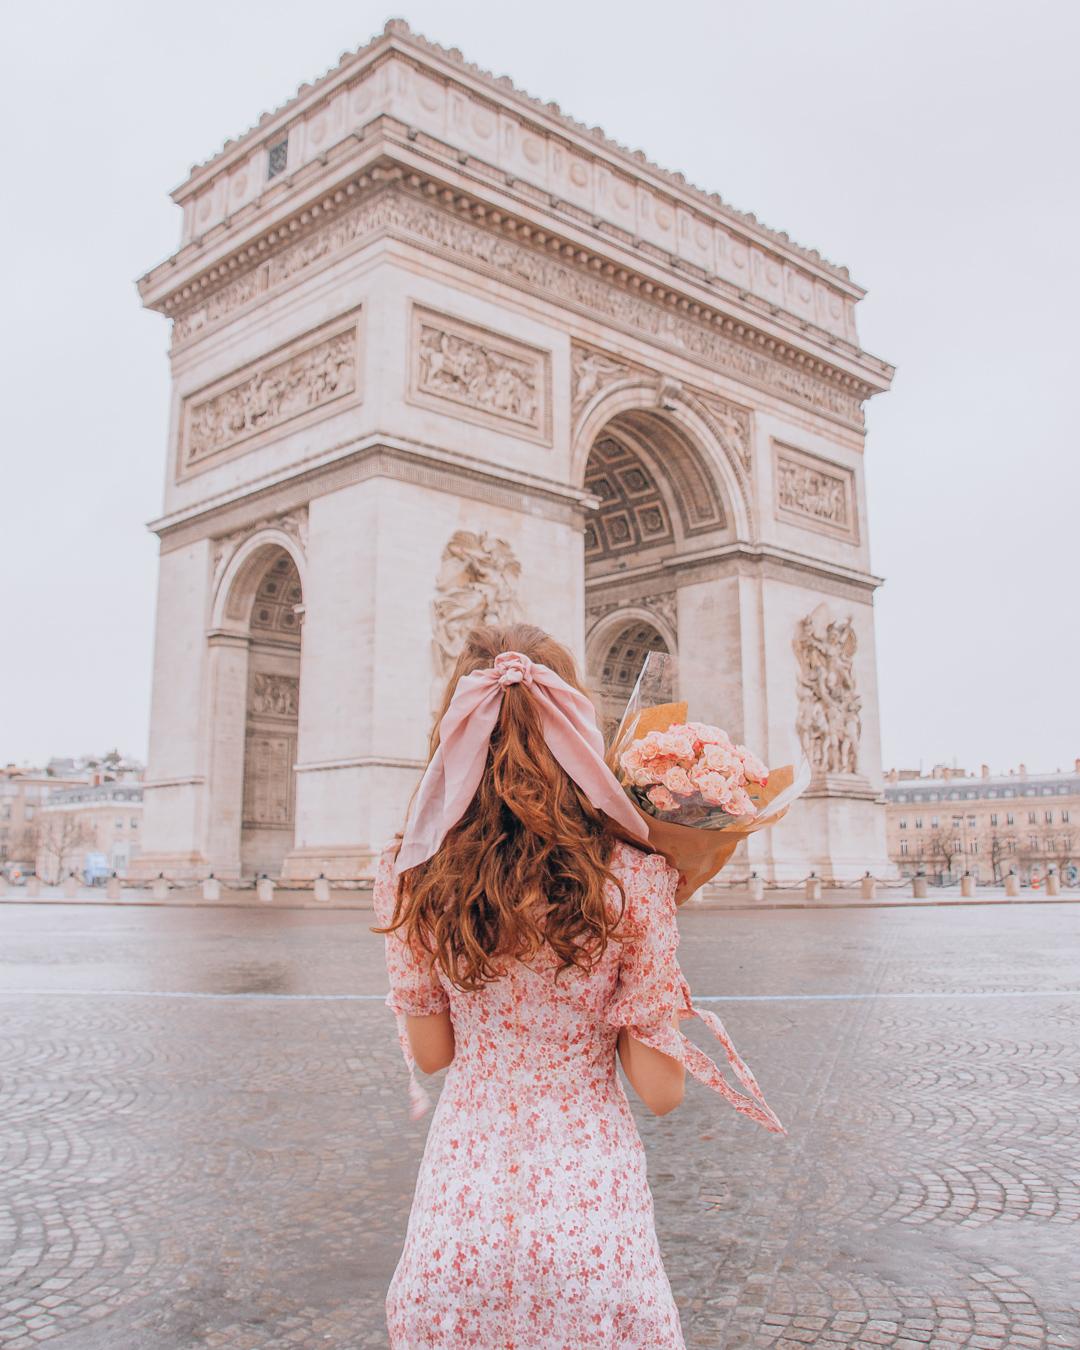 Rainy day in Paris at the Arc de Triomphe